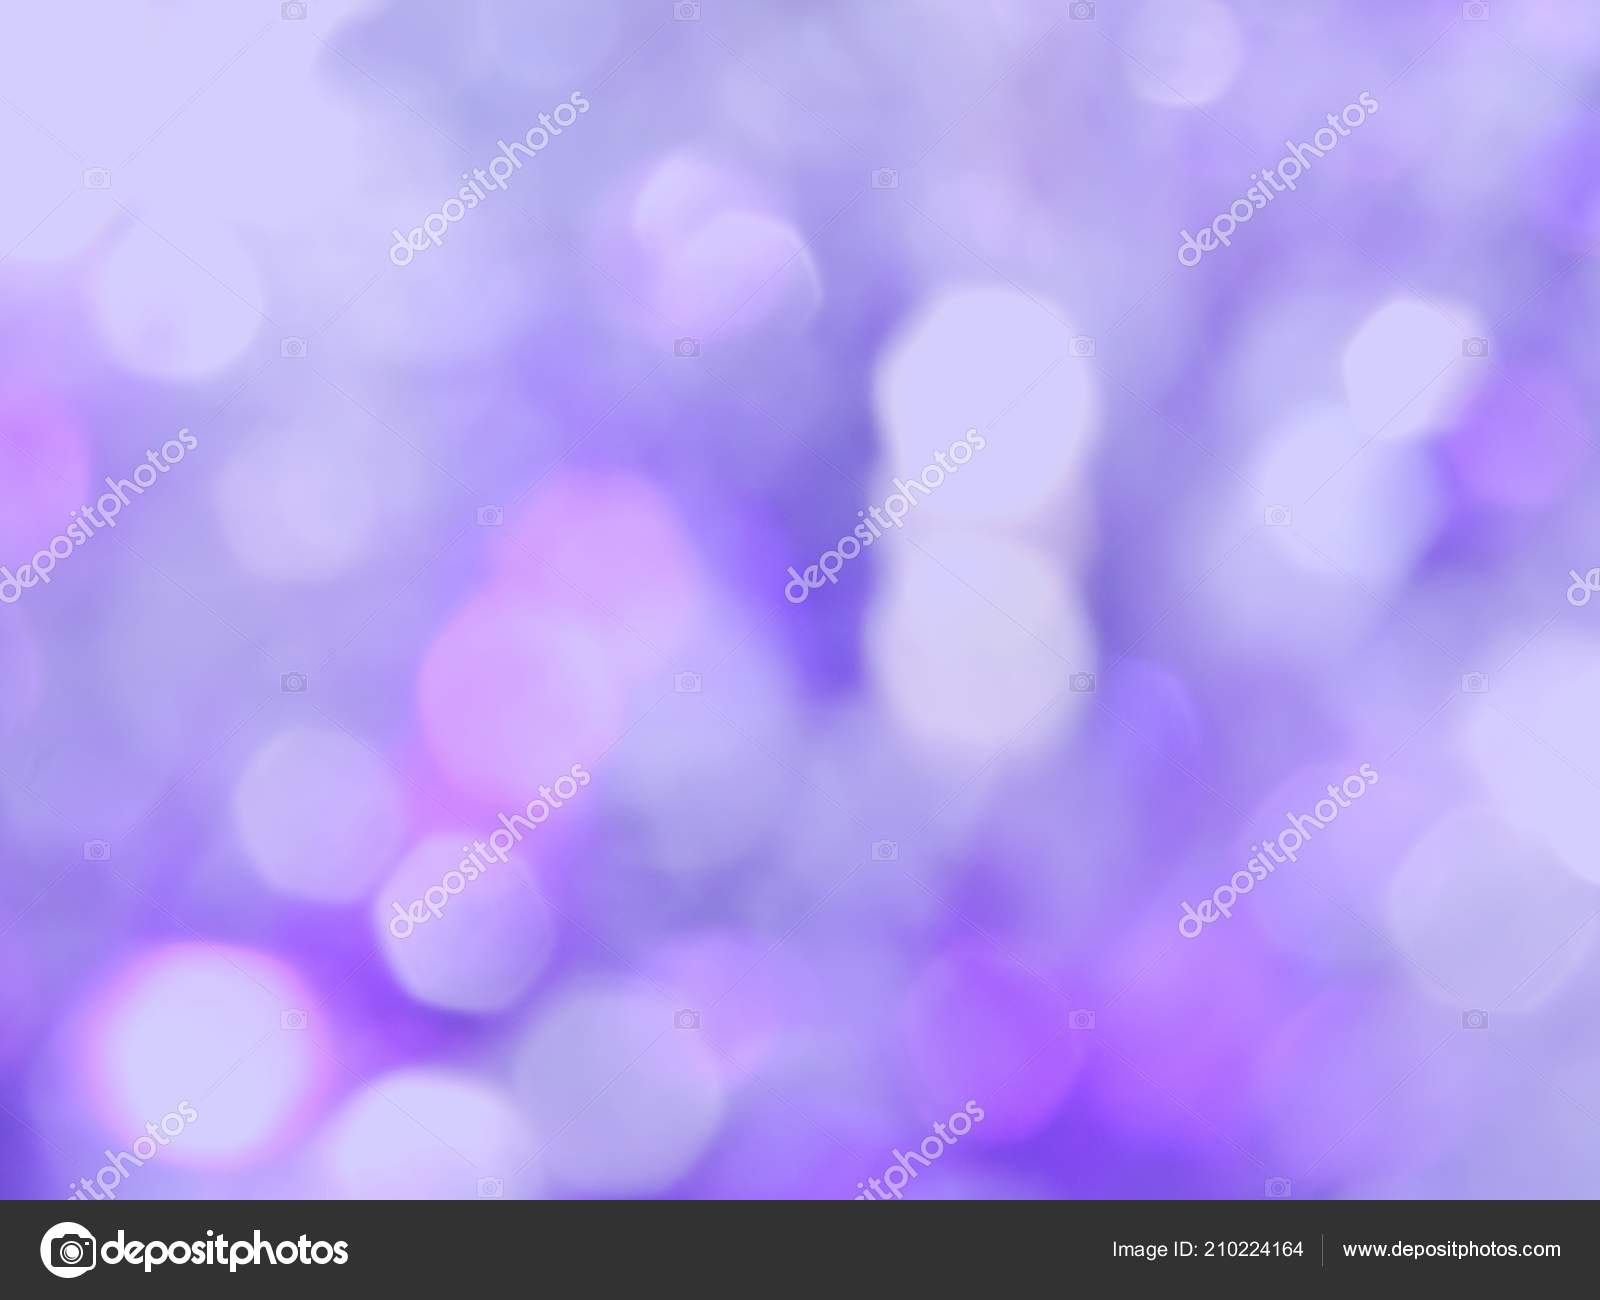 Purple Color Abstract Background Blurred Defocus Bokeh Light